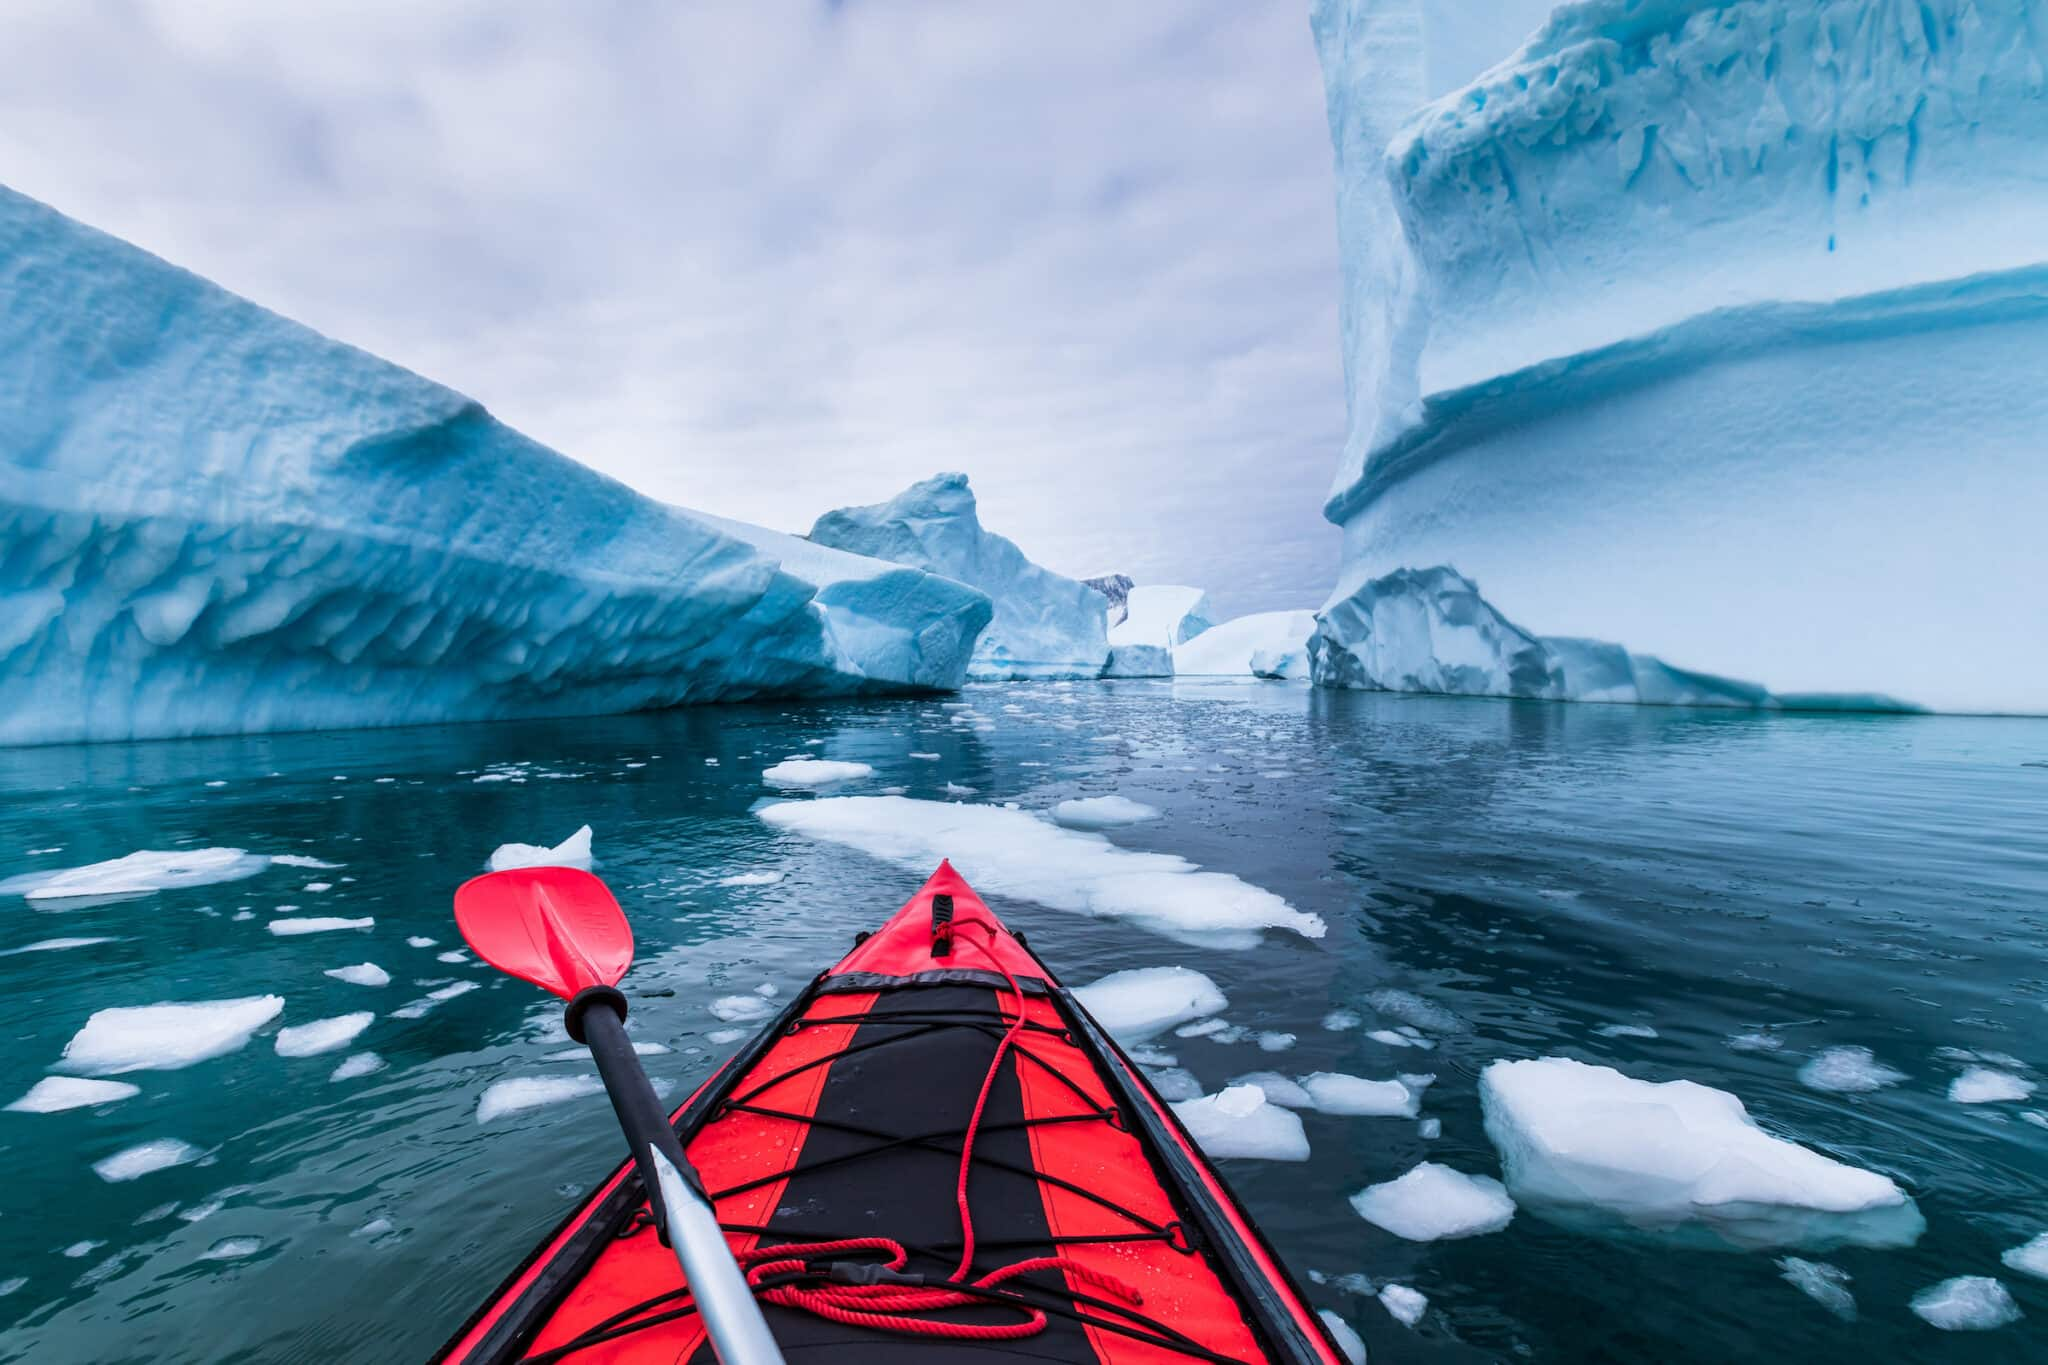 Kayaking in Antarctica between icebergs with inflatable kayak, extreme adventure in Antarctic Peninsula , beautiful pristine landscape, sea water paddling activity